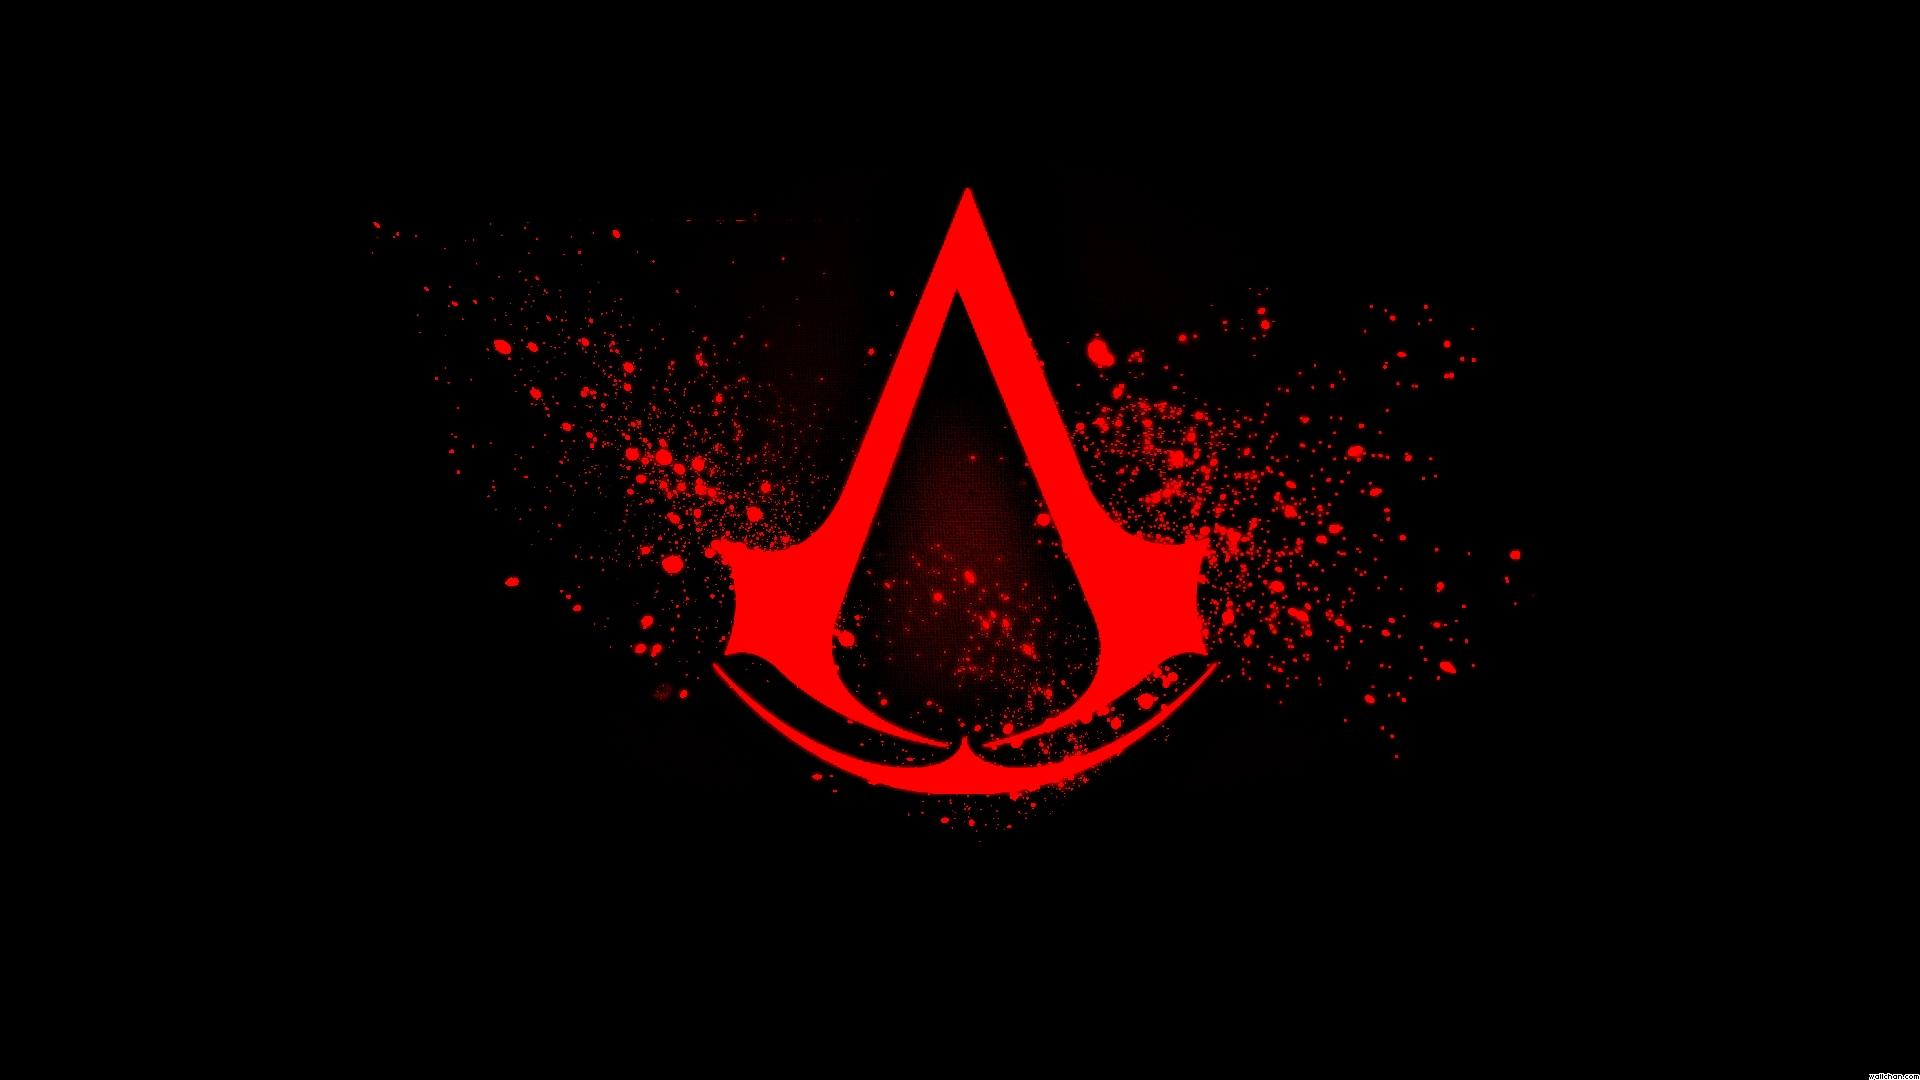 Welcome/Tervetuloa 8443-red-assassins-creed-symbol